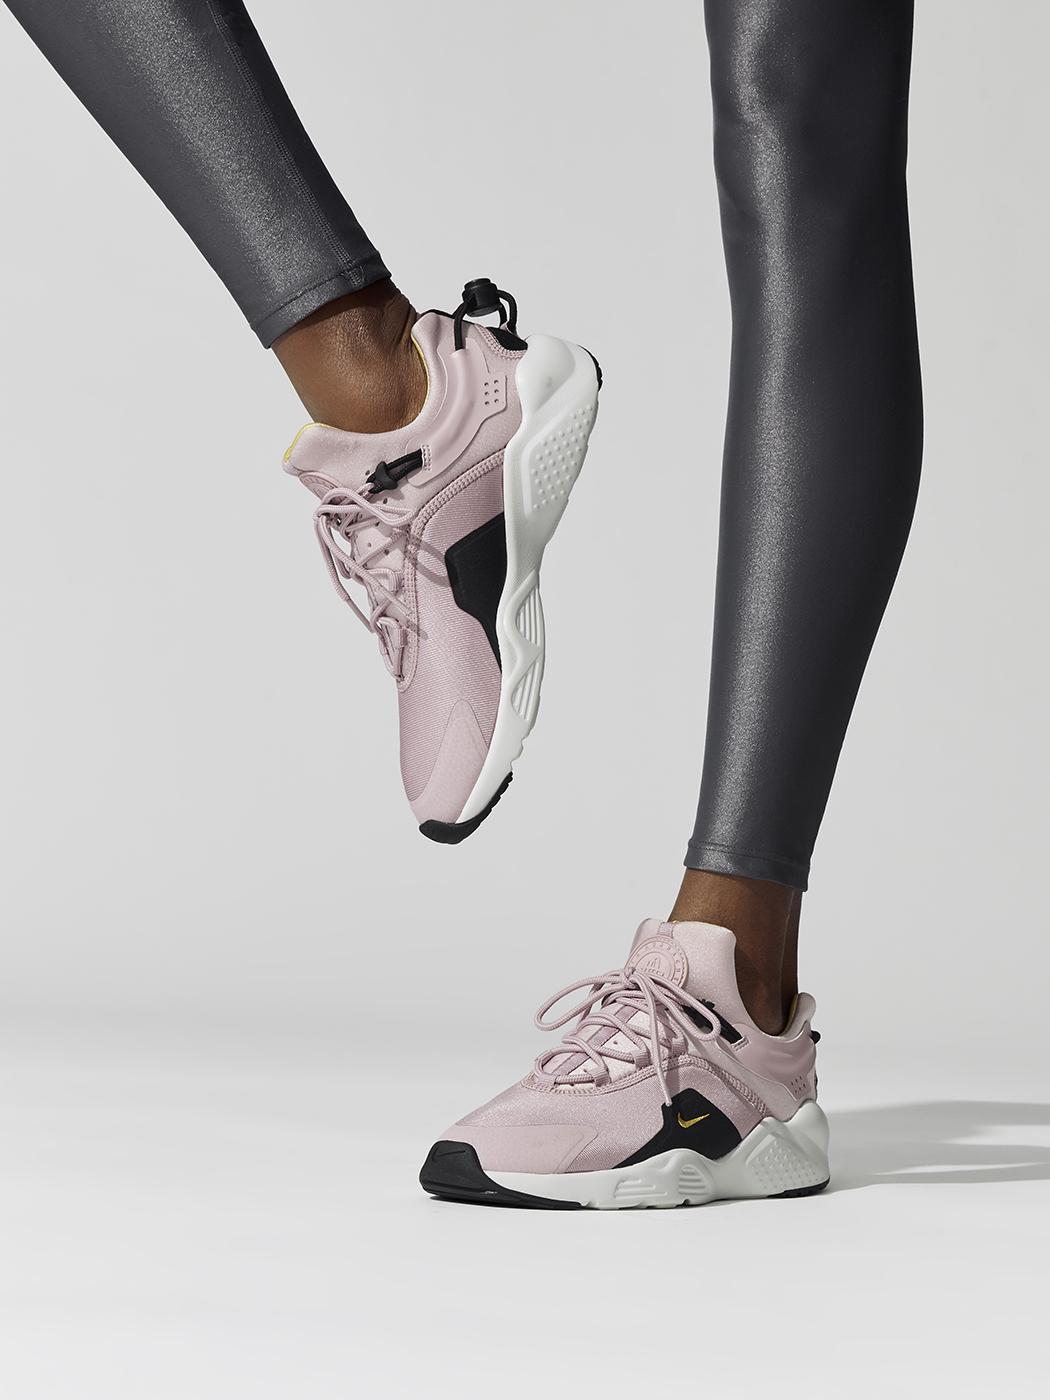 Women's Nike Air Huarache City Move in